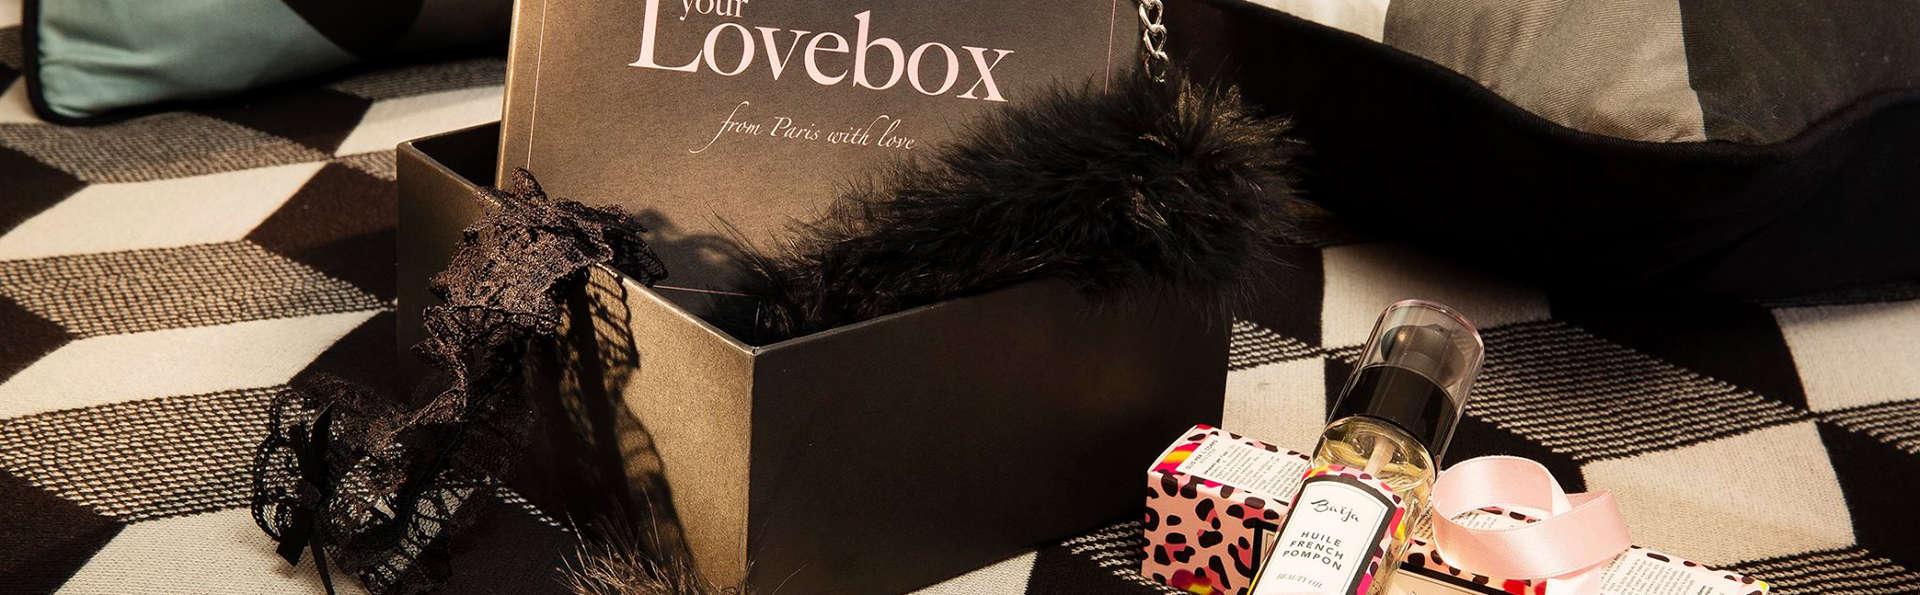 Simon's Boutique Hotel - EDIT_LOVEBOX2.jpg